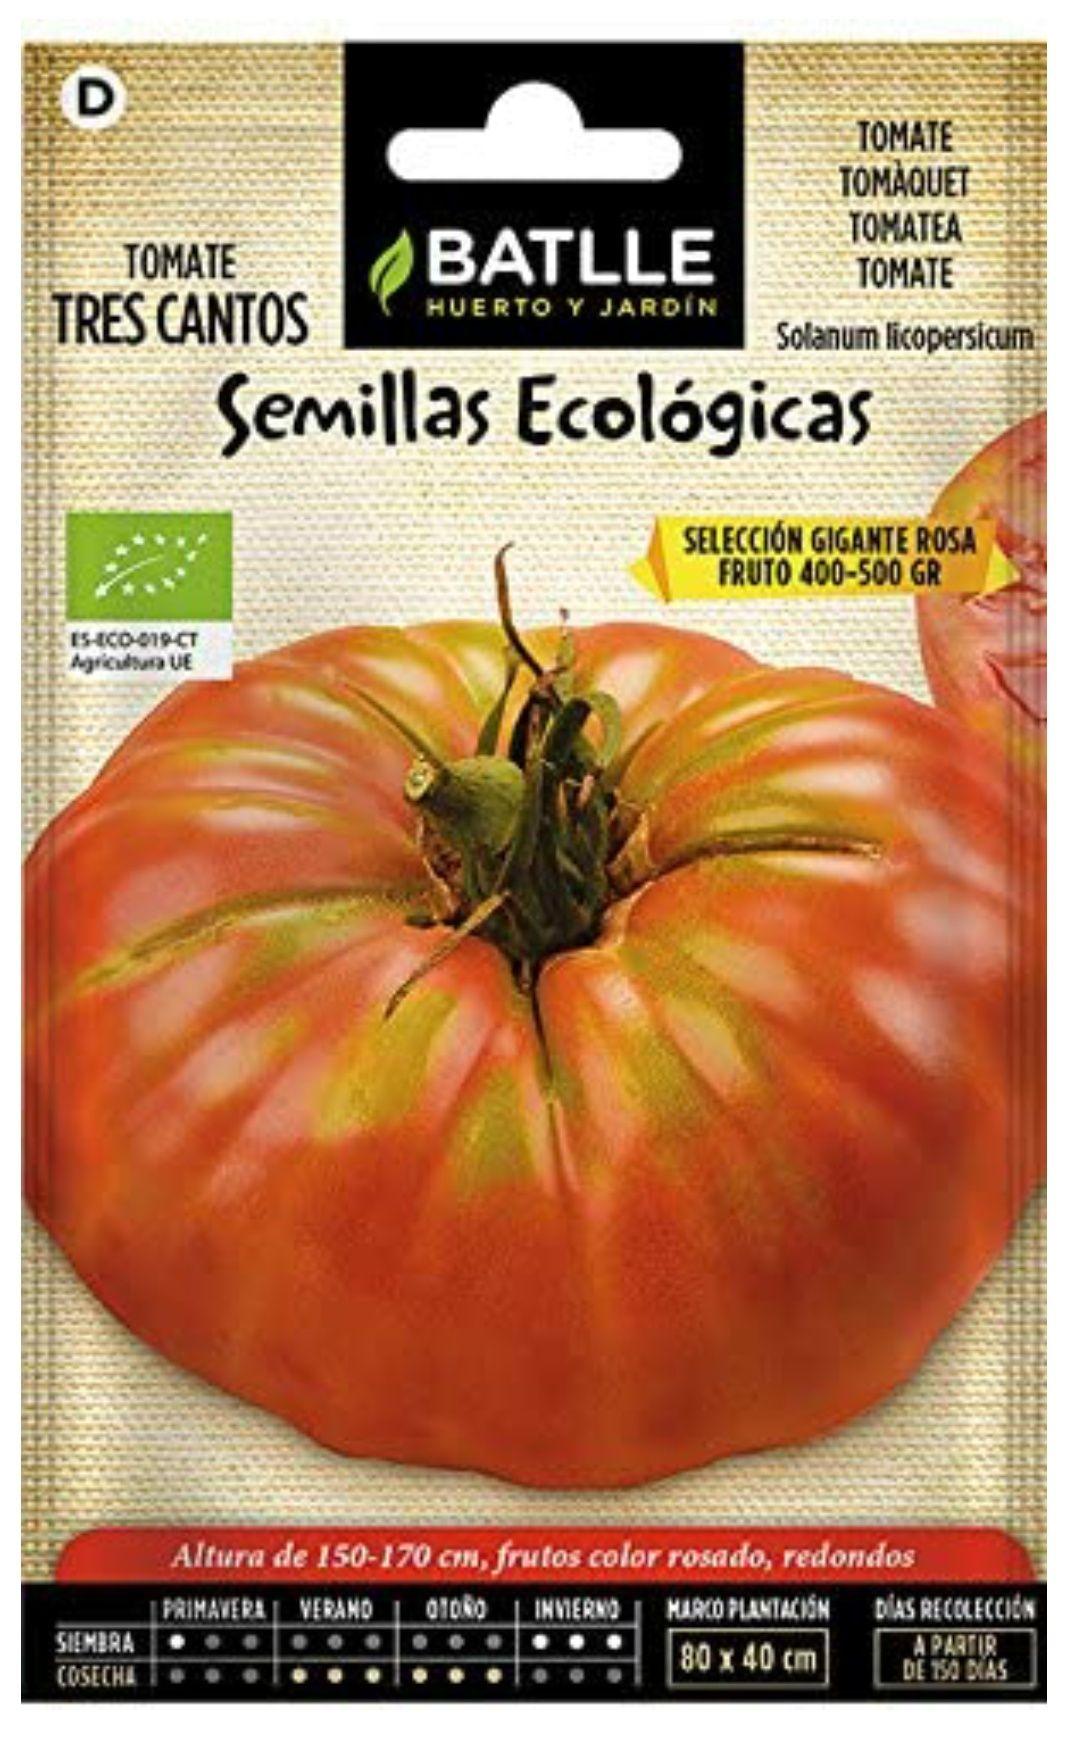 Semillas Ecológicas HORTÍCOLAS - TOMATE gigante rosa - ECO